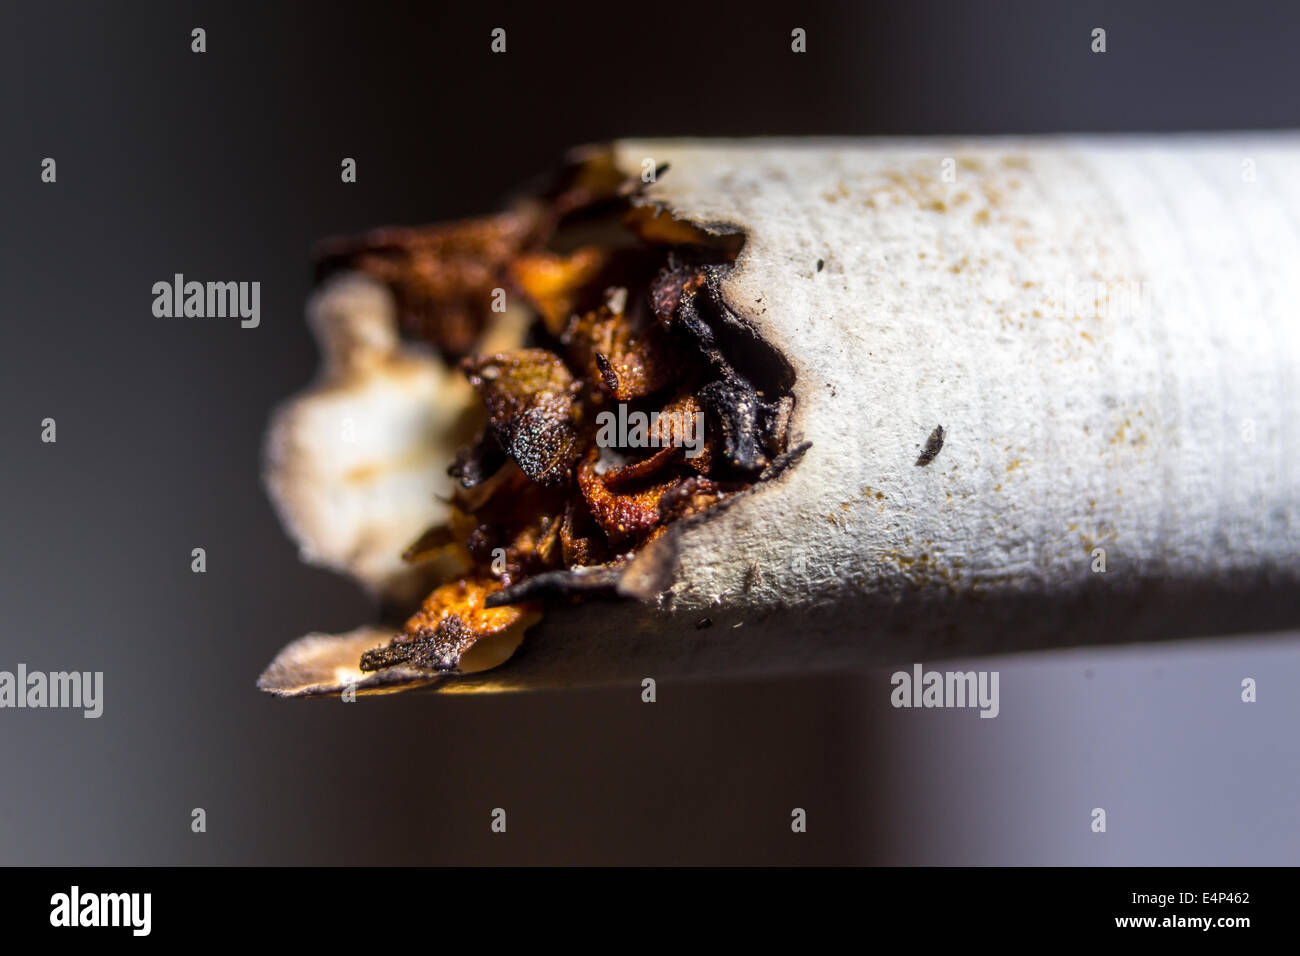 Closeup o unhealthy smoked cigarette - Stock Image